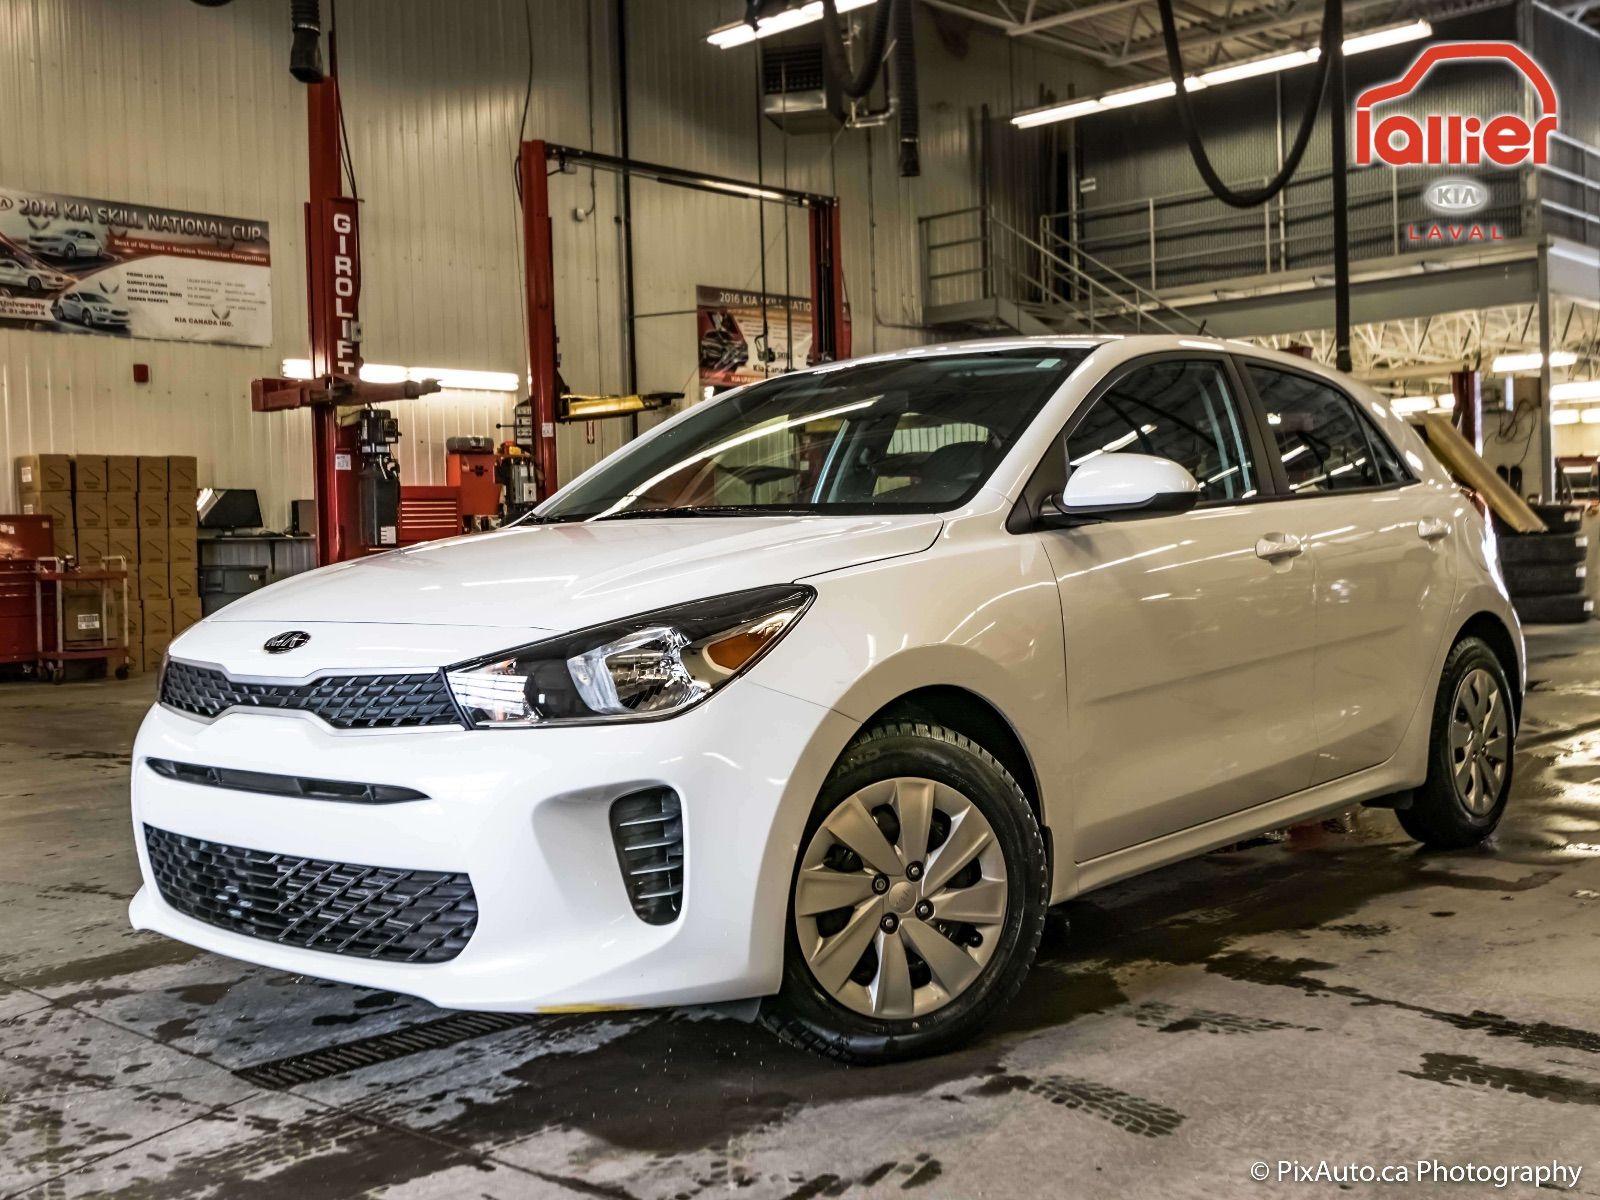 canada leasecosts rio a manual lease in bm kia lx cars